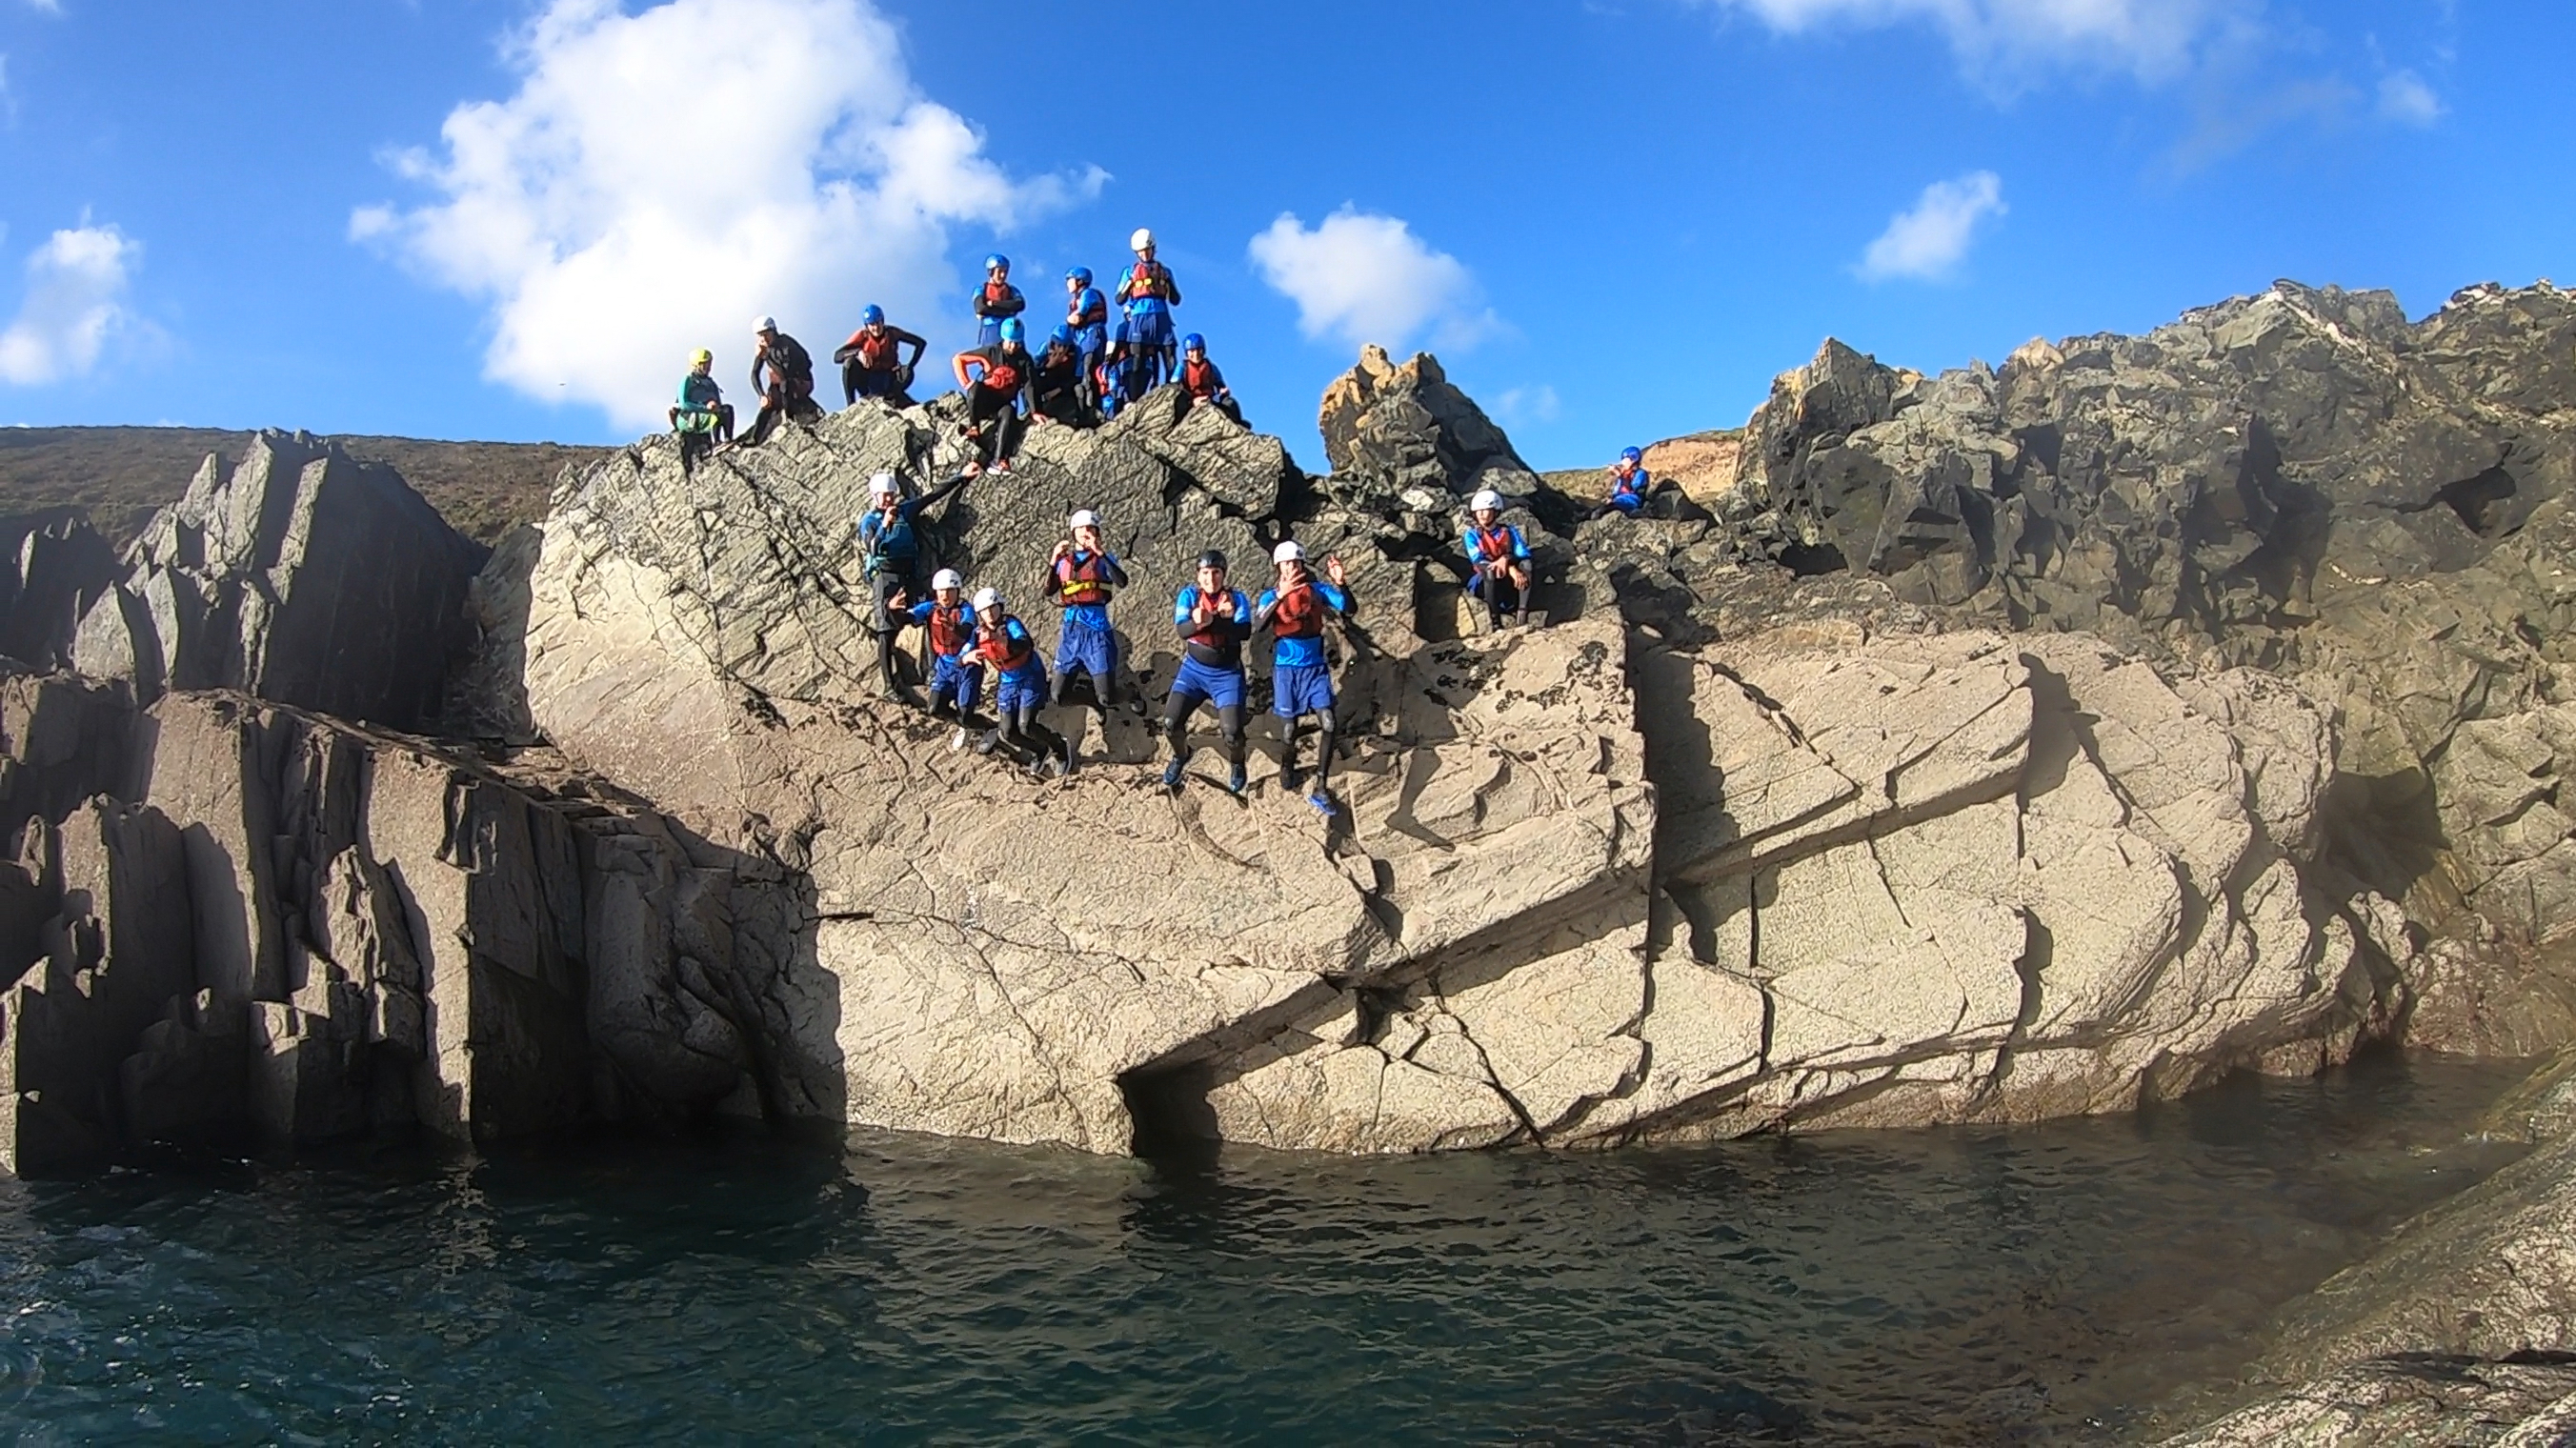 coasteering at kids camp